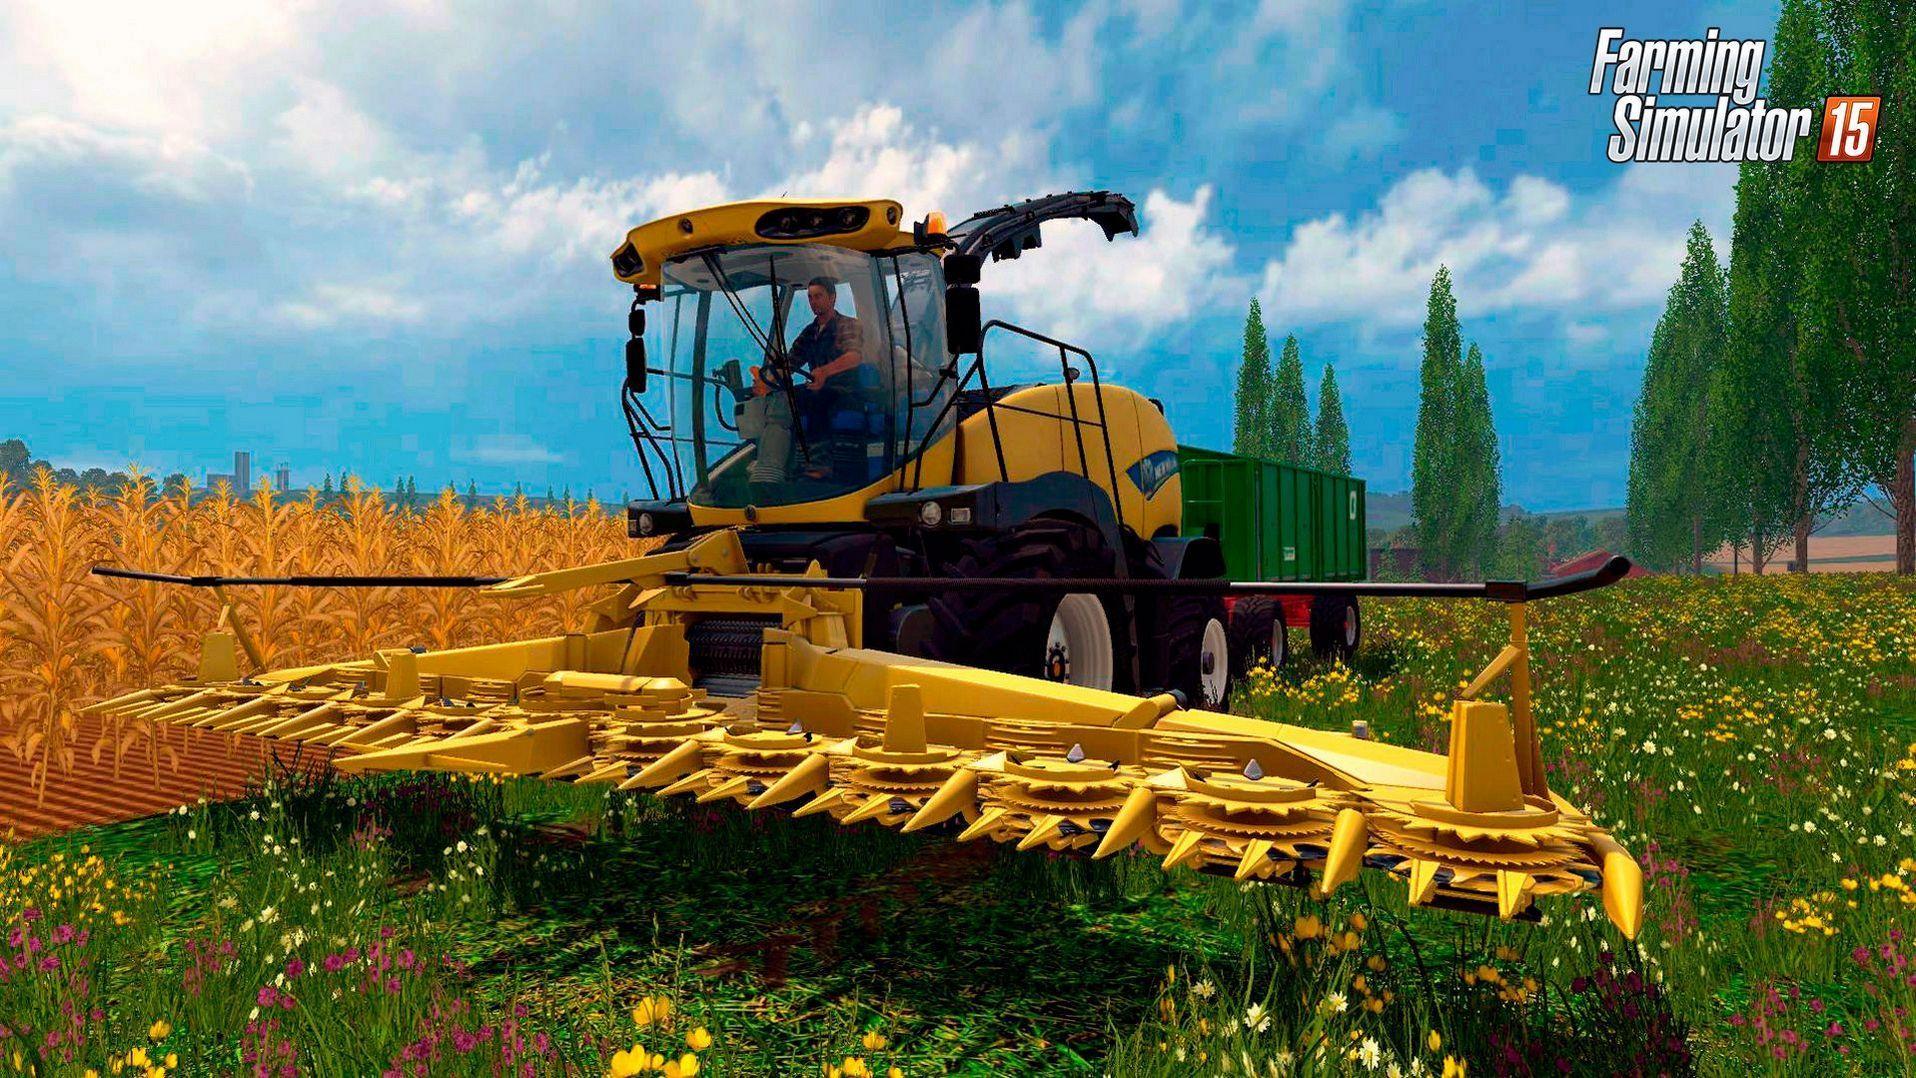 Llega La Segunda Expansión De Farming Simulator 15 Expansion